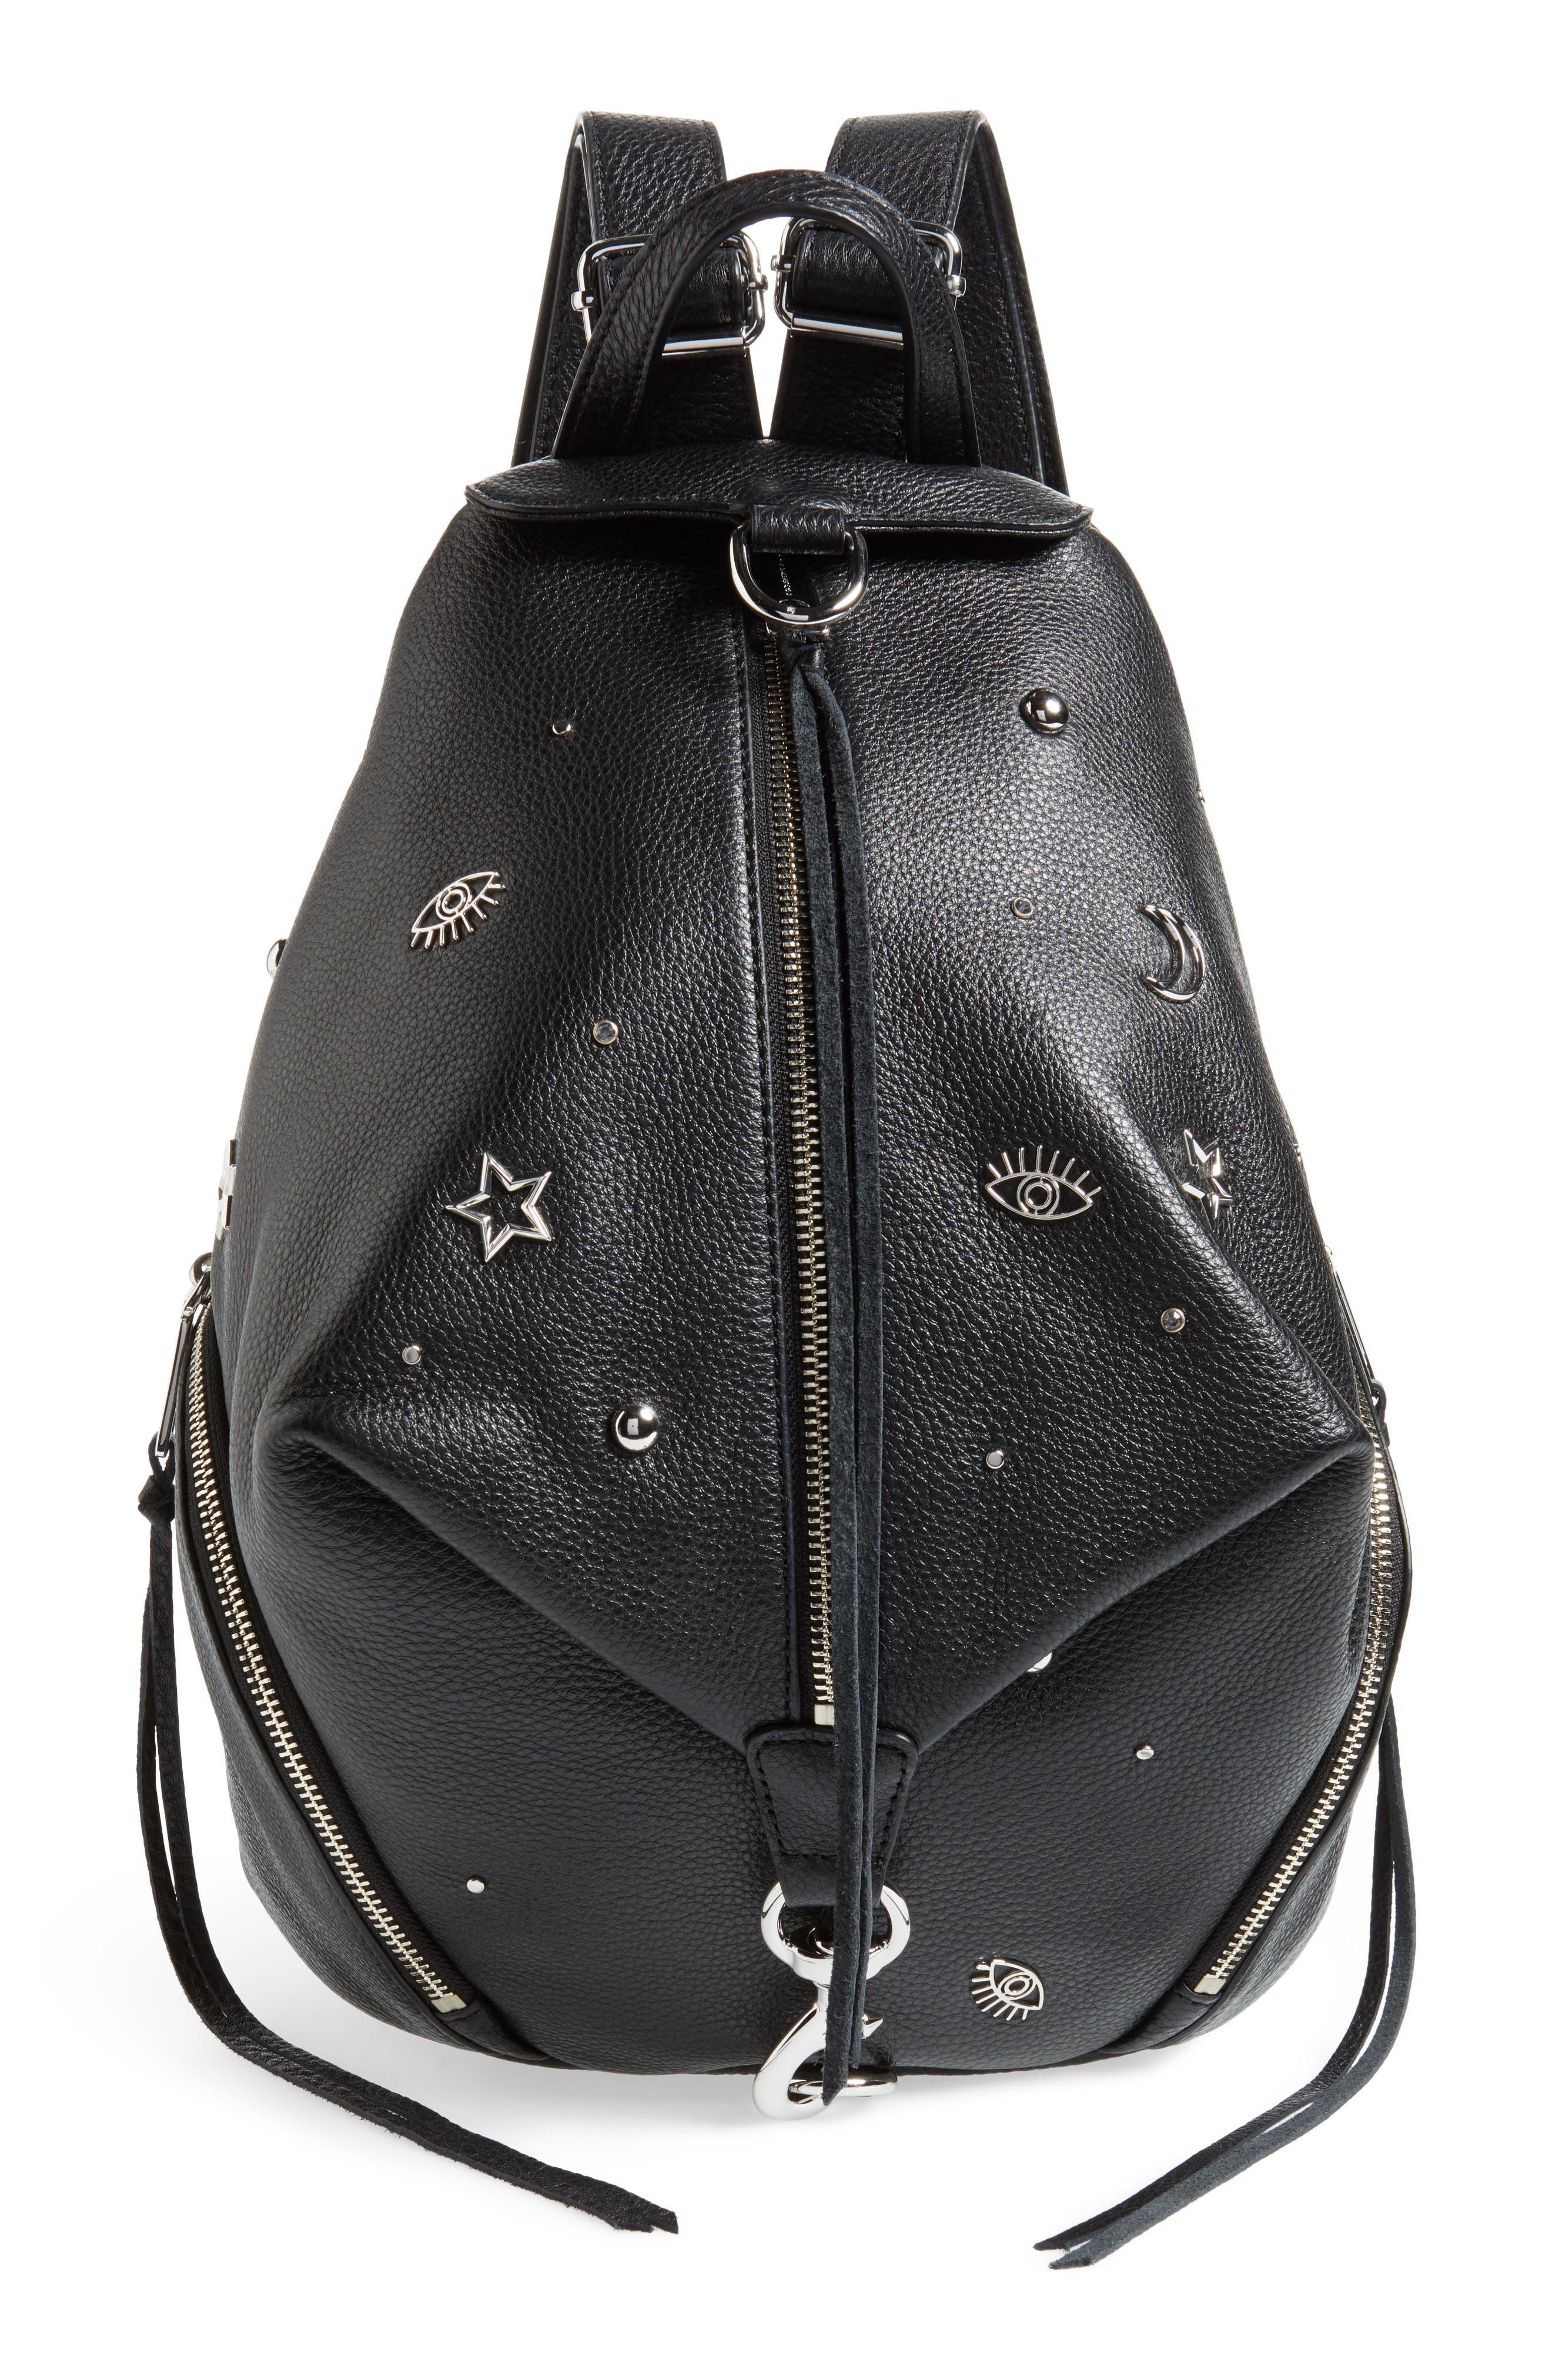 Rebecca Minkoff Julian Embellished Leather Backpack